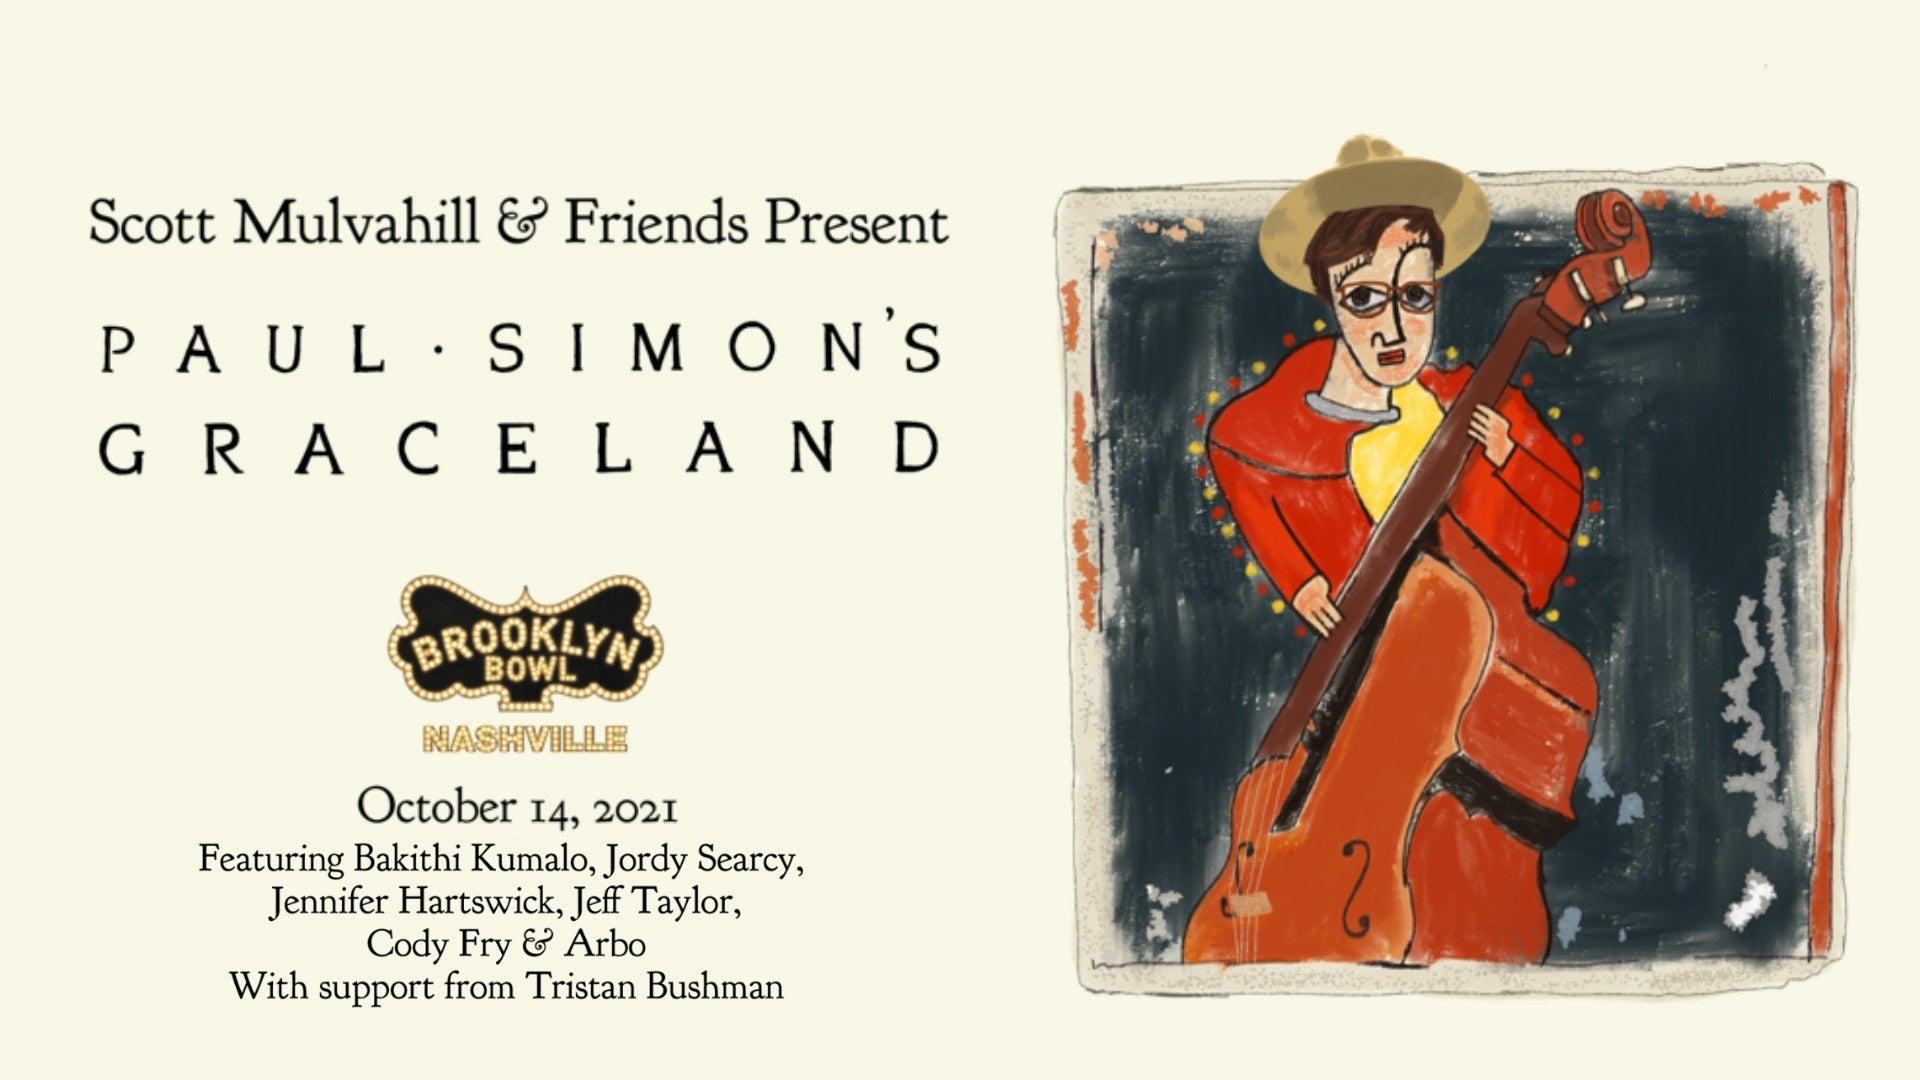 More Info for CONTEST! Scott Mulvahill & Friends Present: Paul Simon's Graceland Tickets + Bowling!